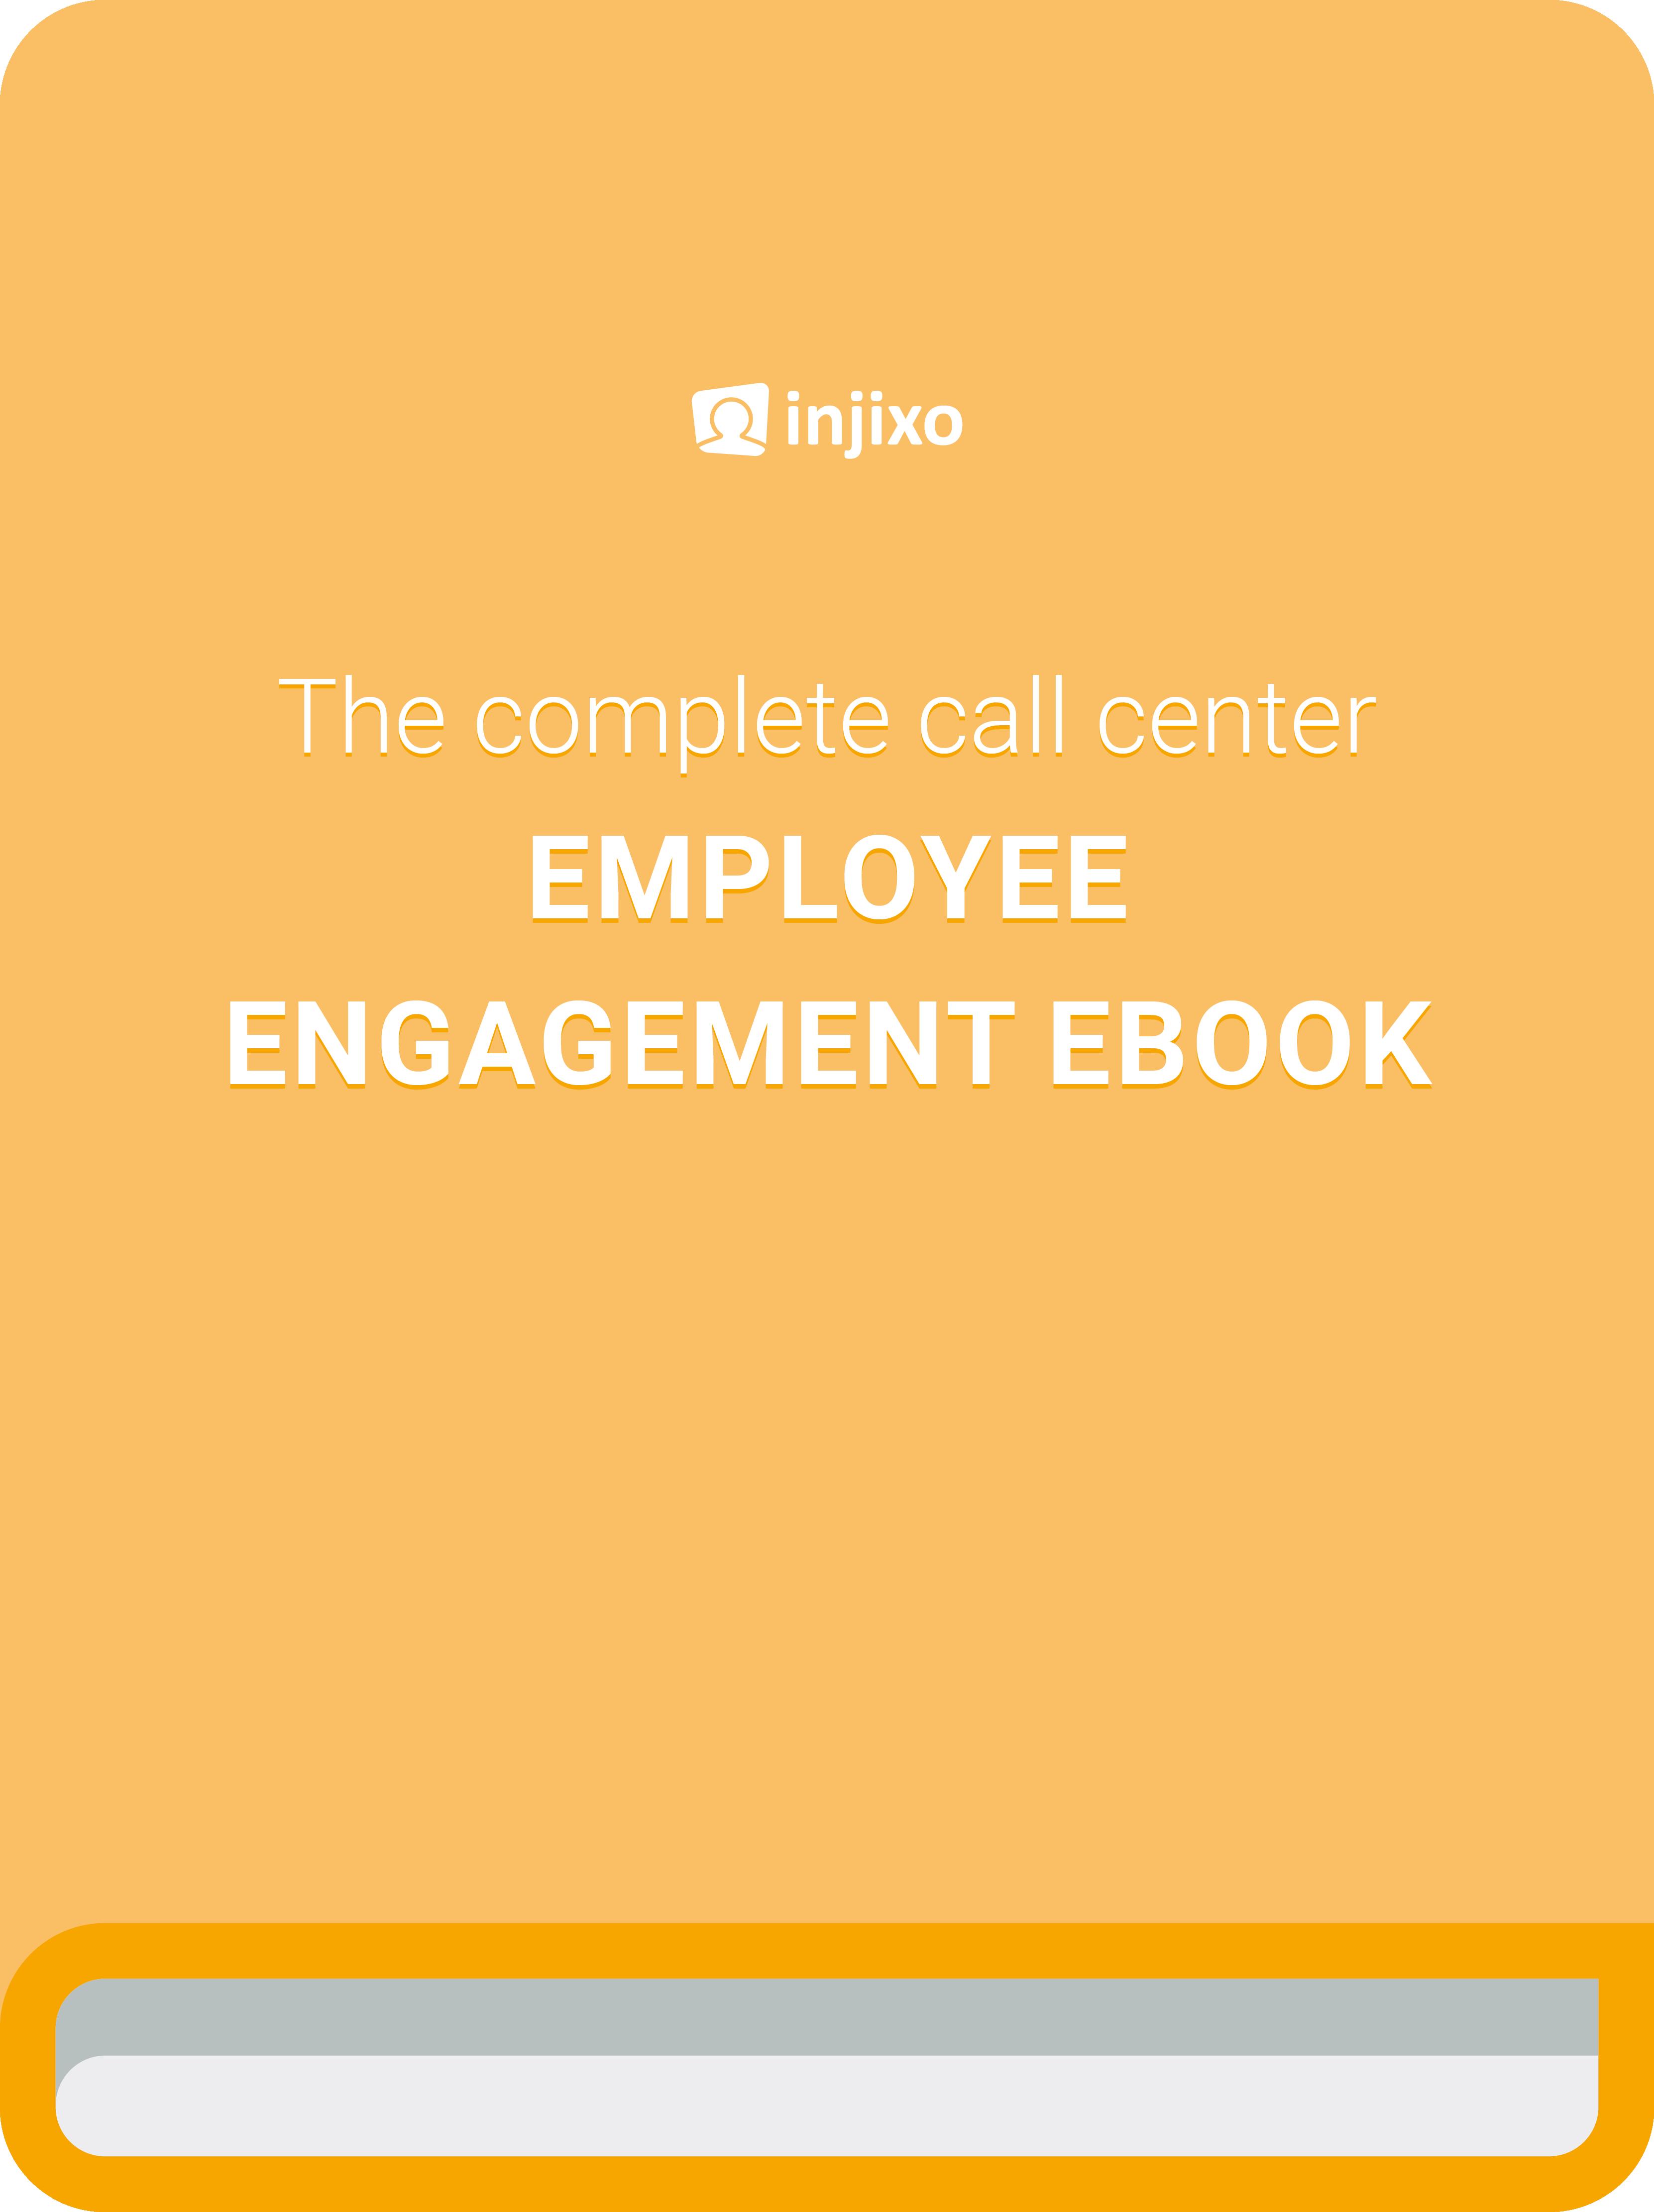 injixo - EN - ebook employee engangement cover